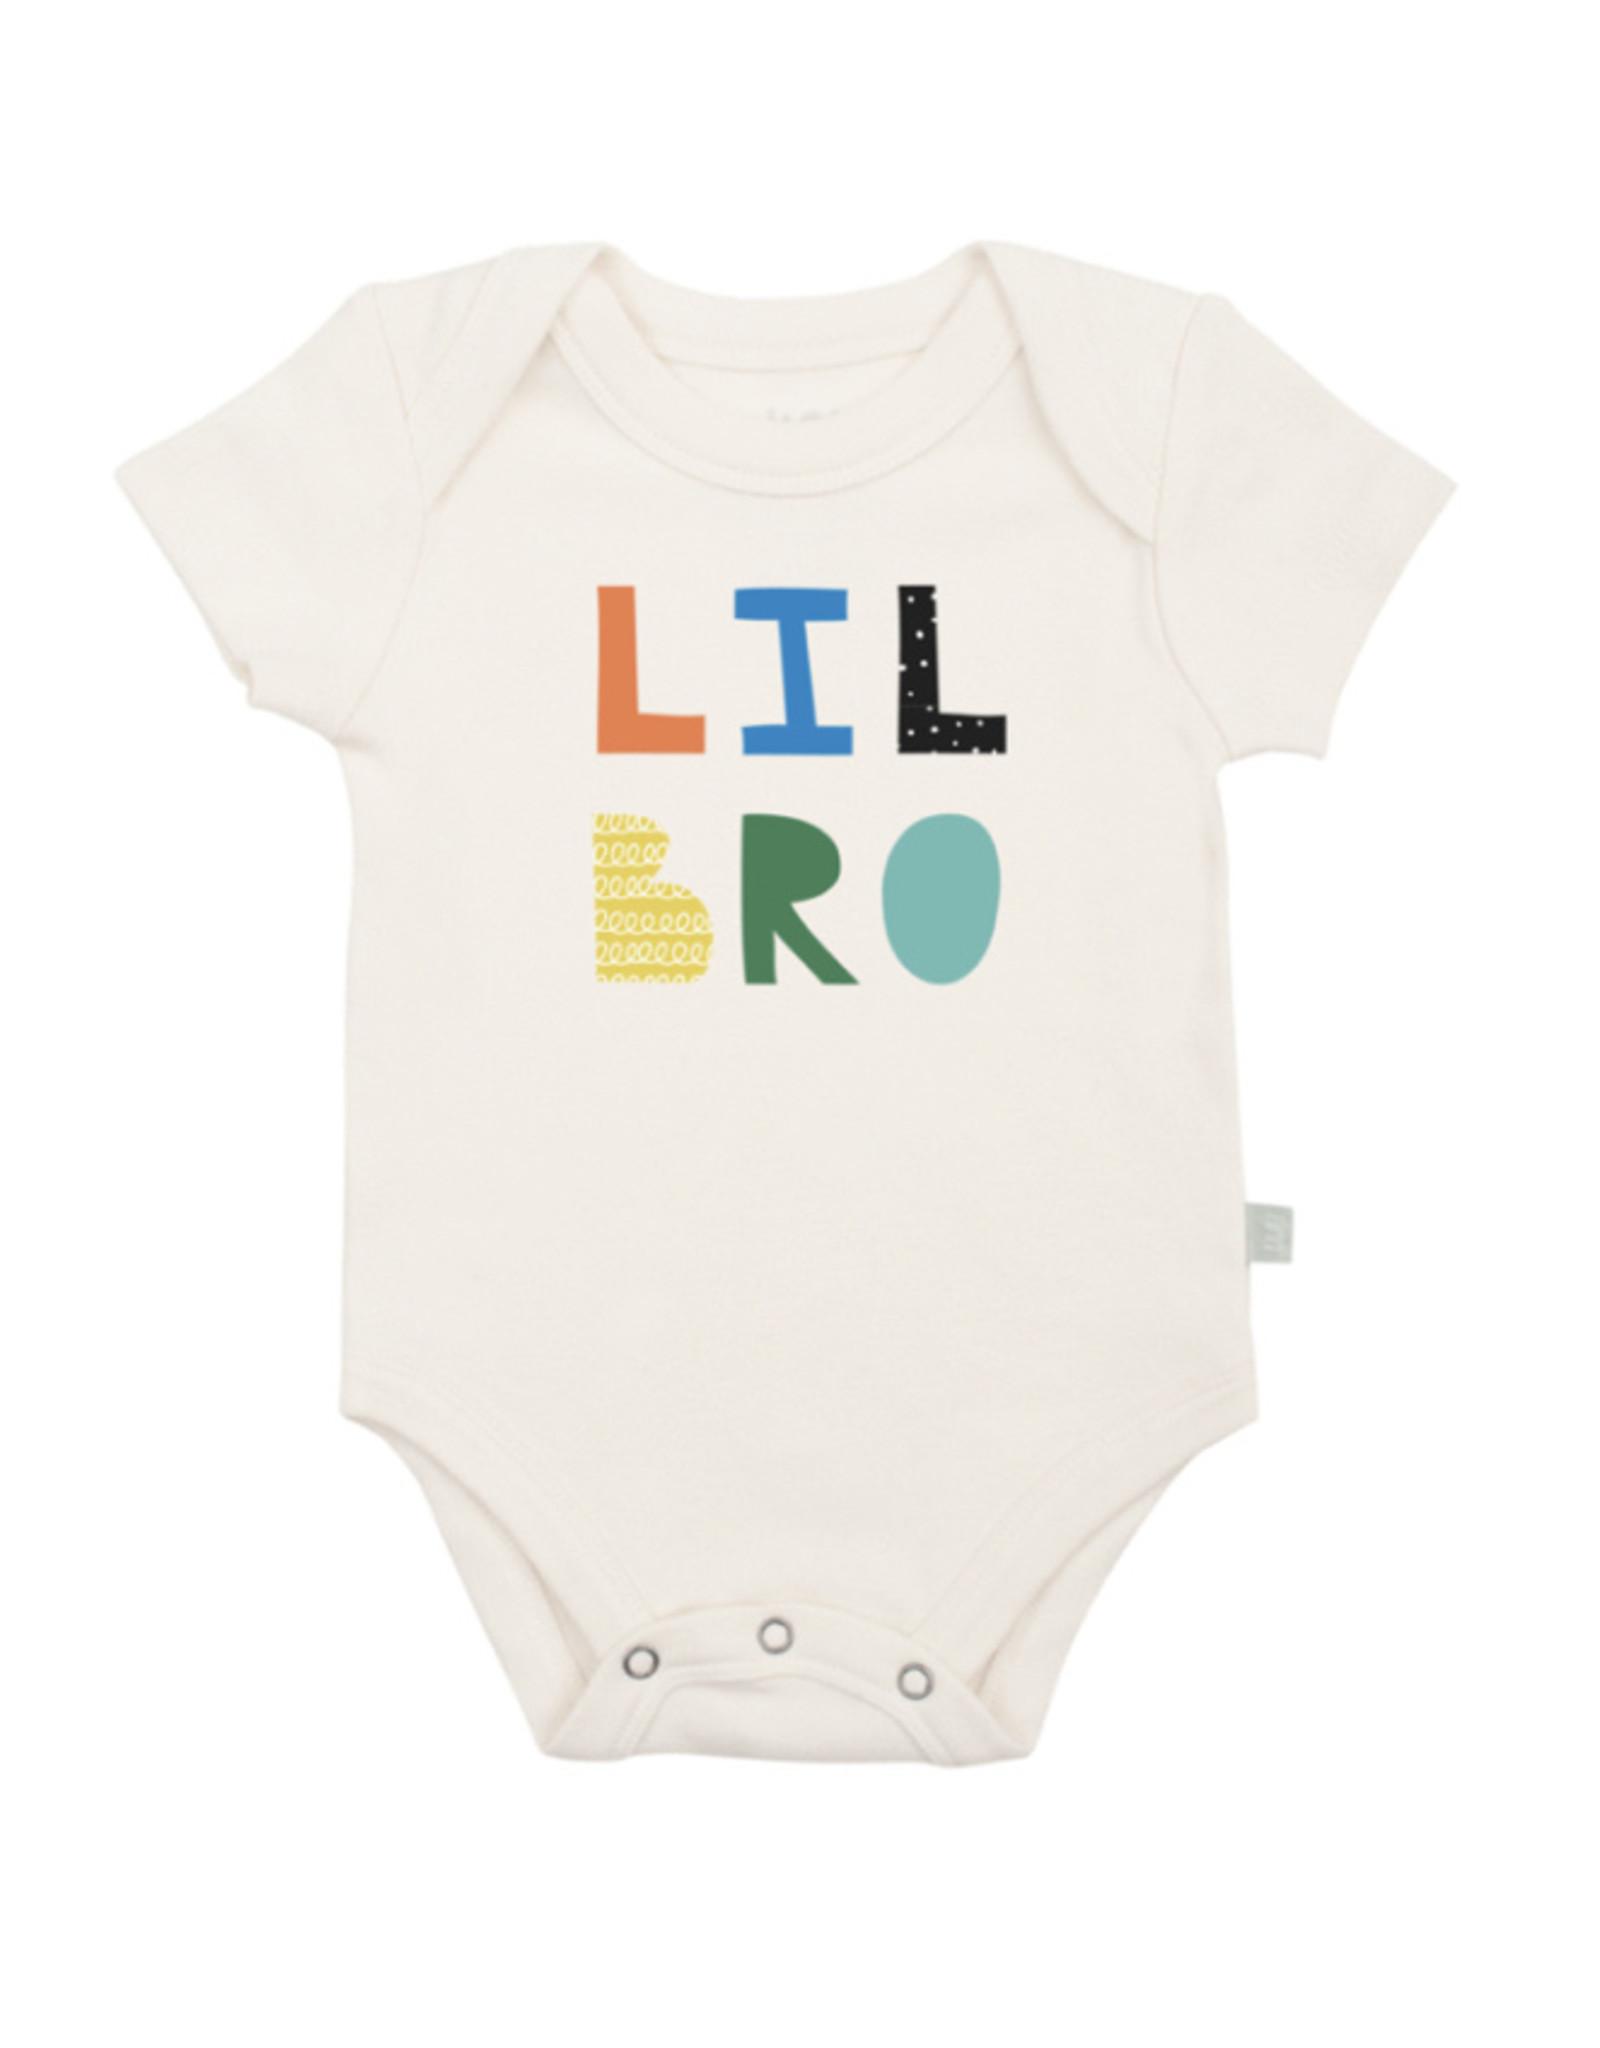 Finn and emma Lil Bro short sleeve onesie